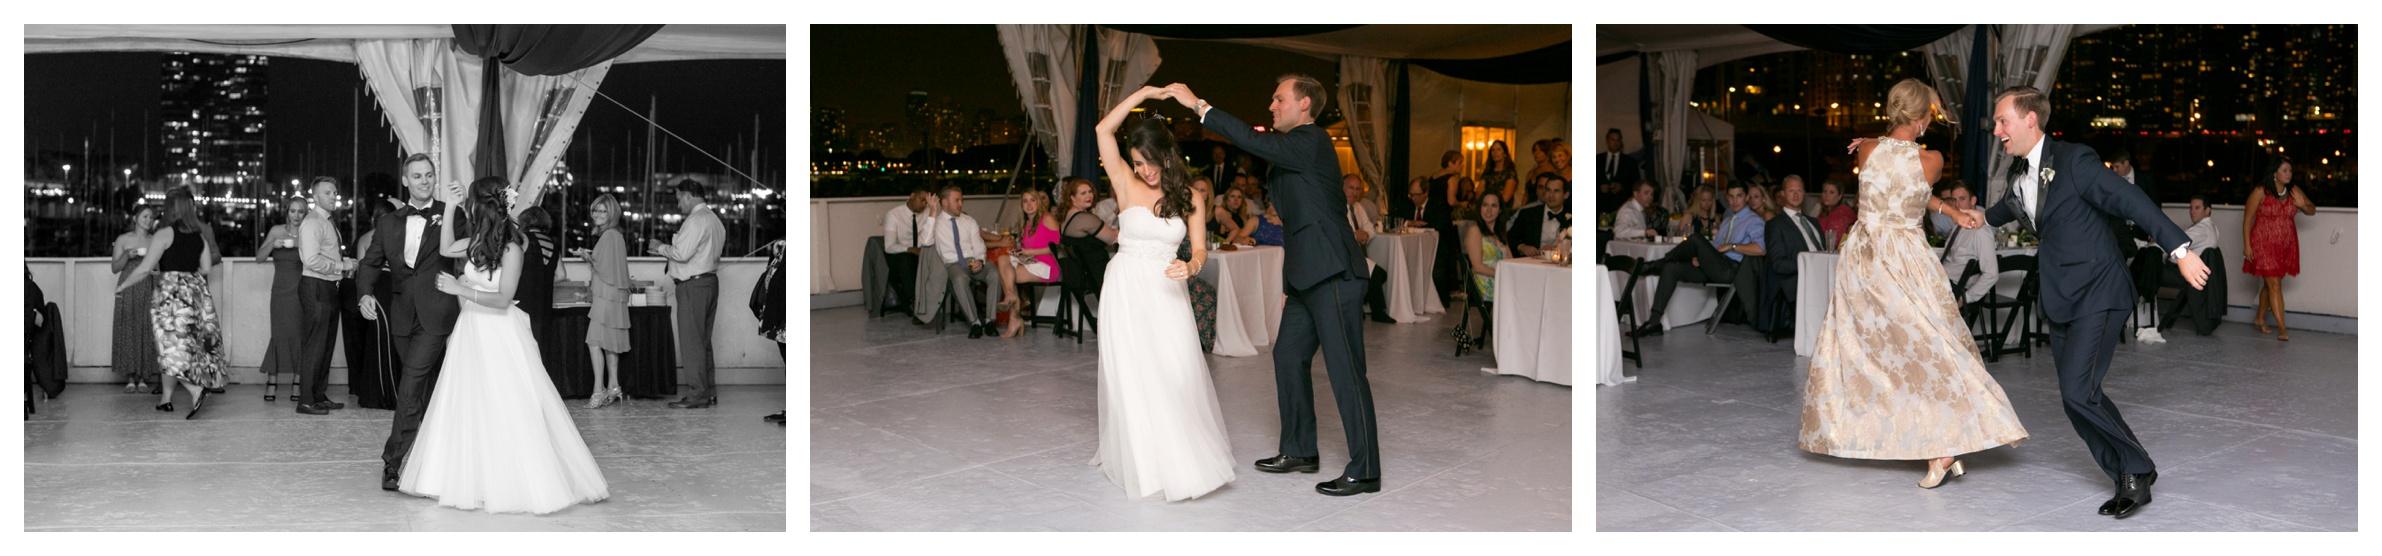 columbia-yacht-club-chicago-wedding_0047.jpg